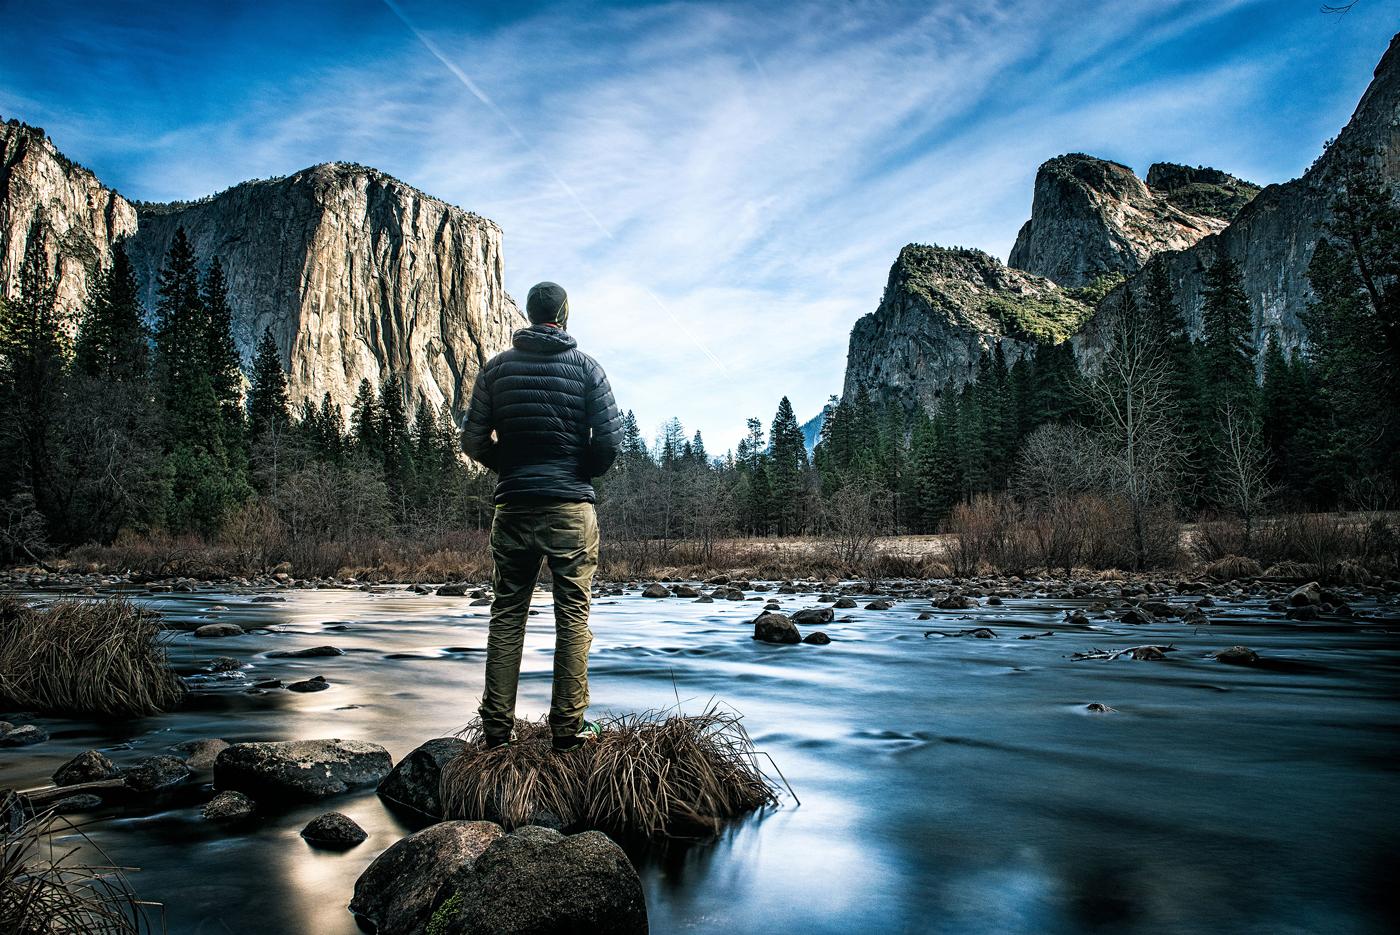 austin-trigg-yosemite-national-park-037-Yosemite-national-park-california-valley-floor-outdoor-lifestyle-hike-camp-adventure-long-exposure-composite.jpg